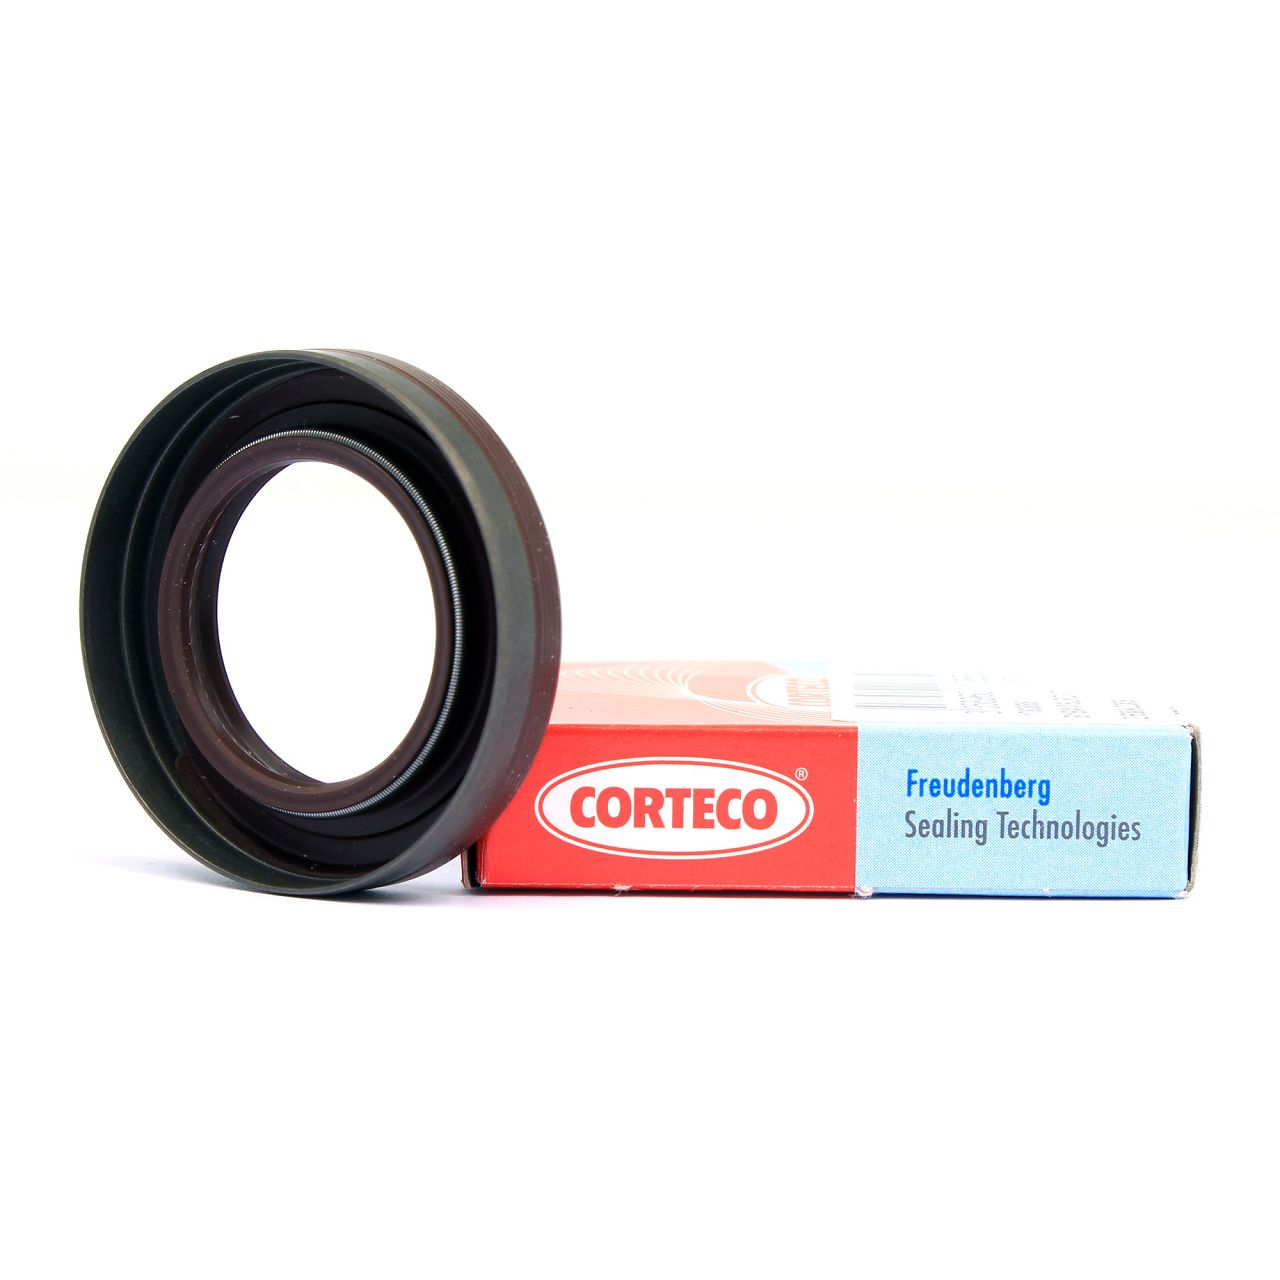 CORTECO Wellendichtring Simmering Ölpumpe 12013858B